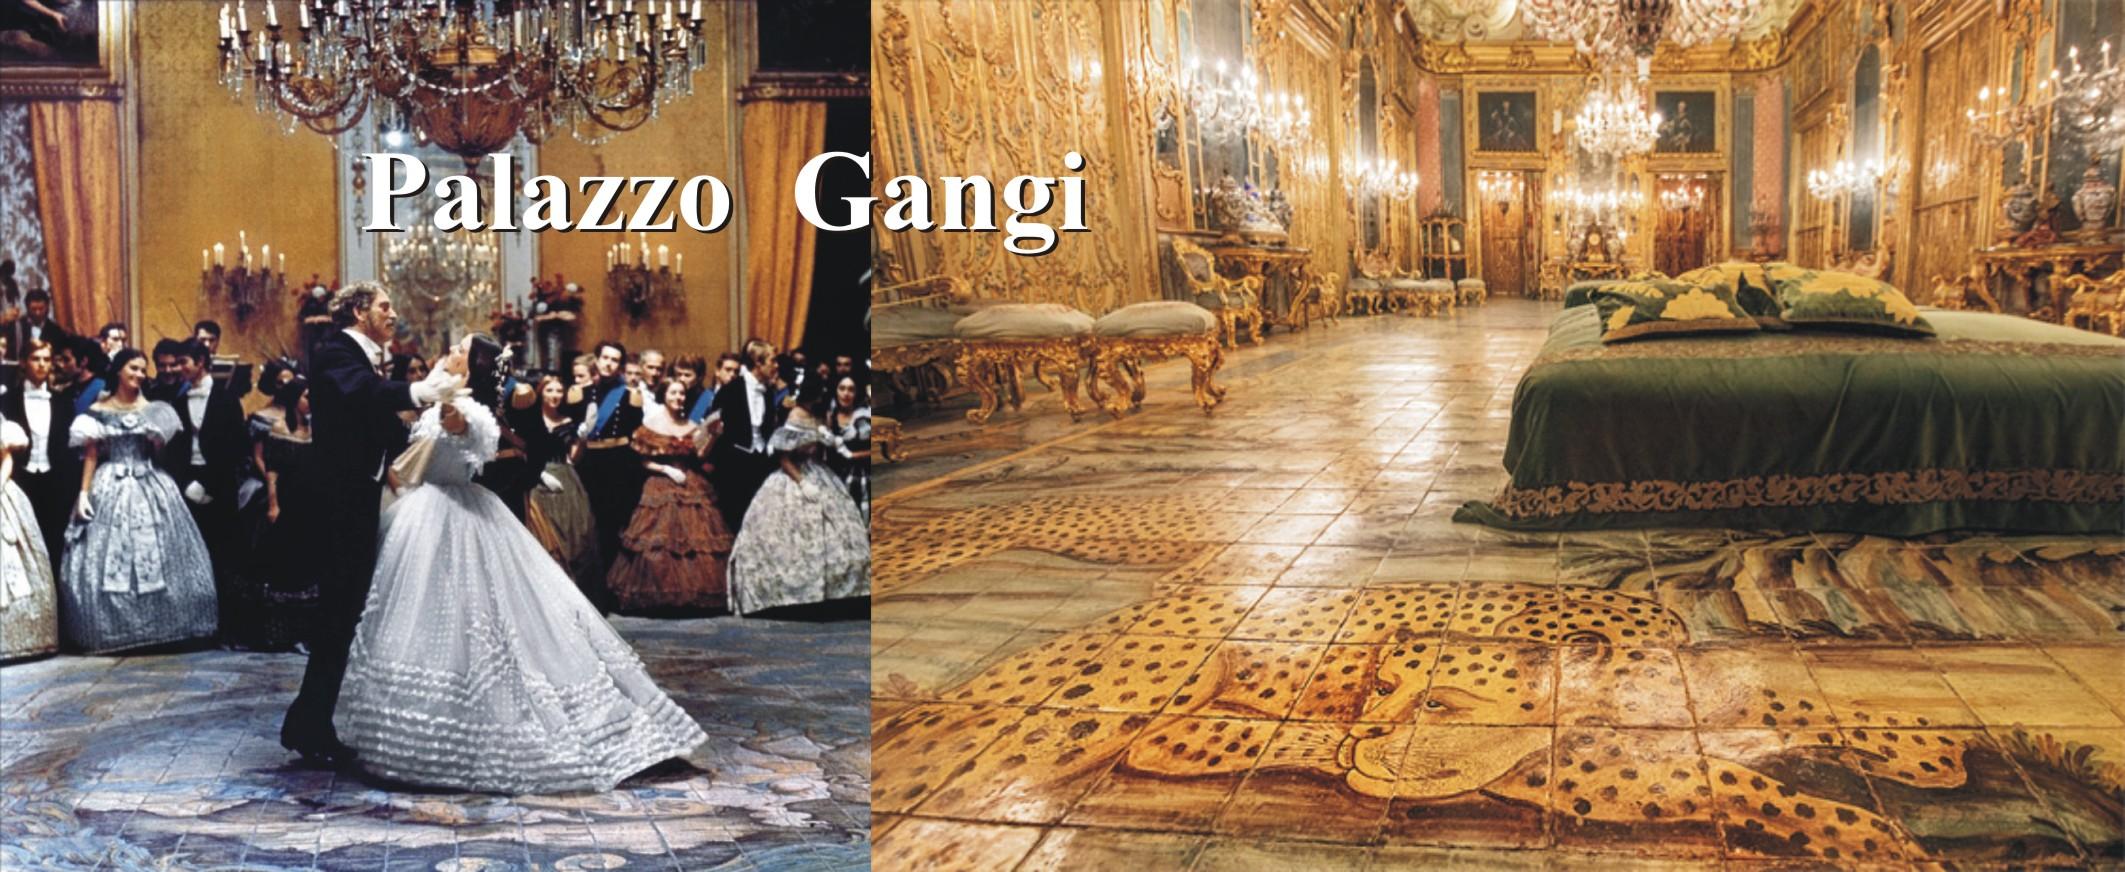 Promofestival - visita al Palazzo Gangi